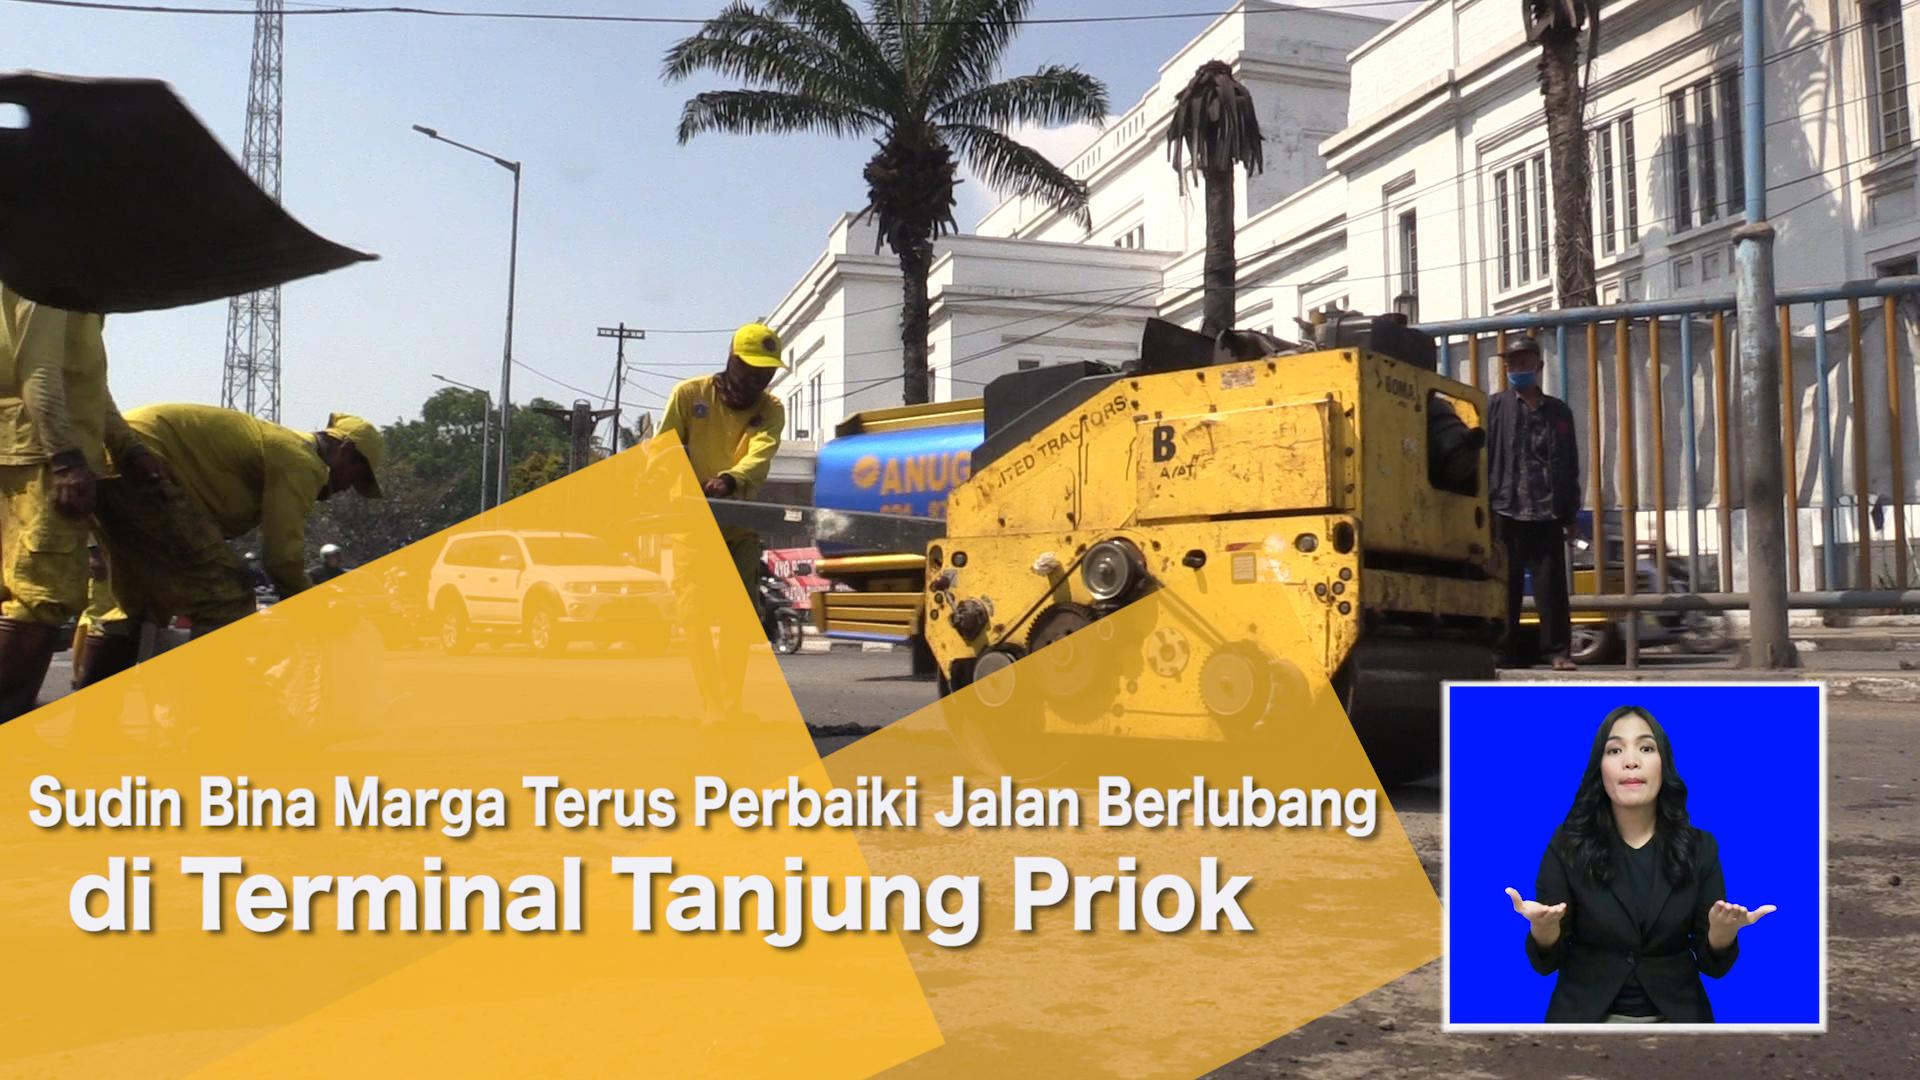 Sudin Bina Marga Terus Perbaiki Jalan Berlubang di Terminal Tanjung Priok